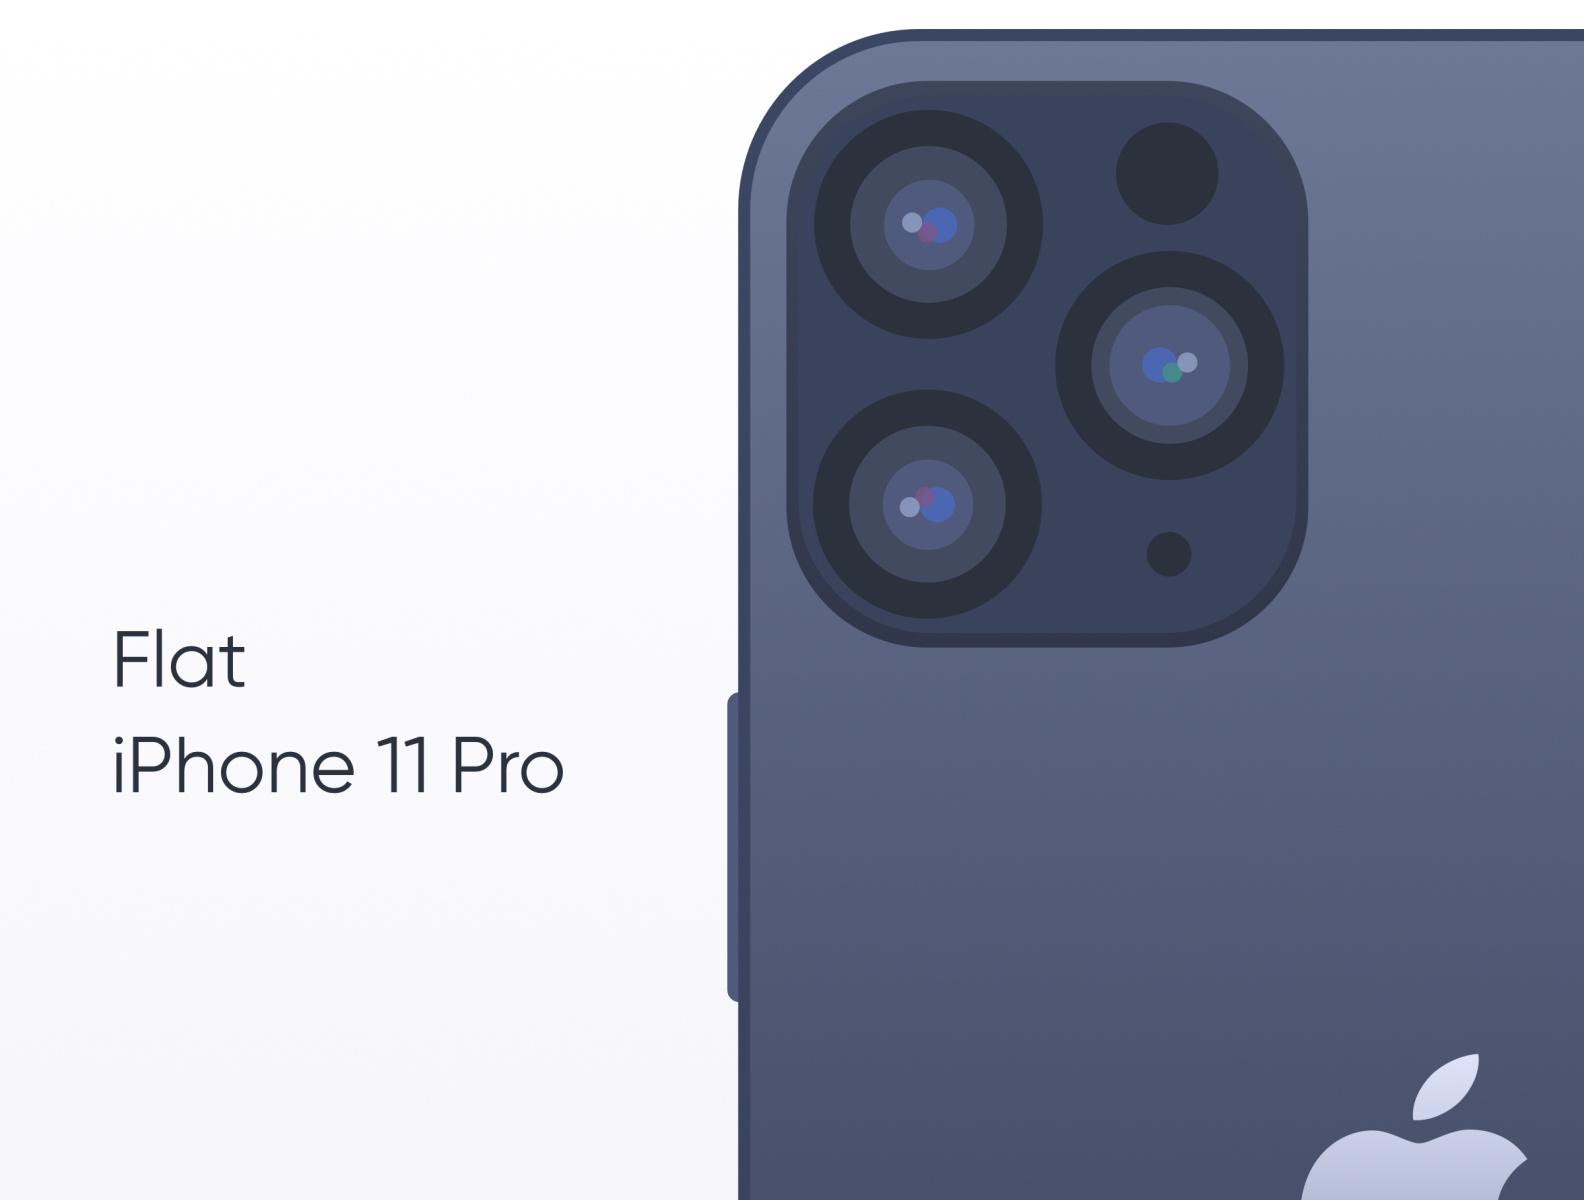 Flat iPhone 11 Pro